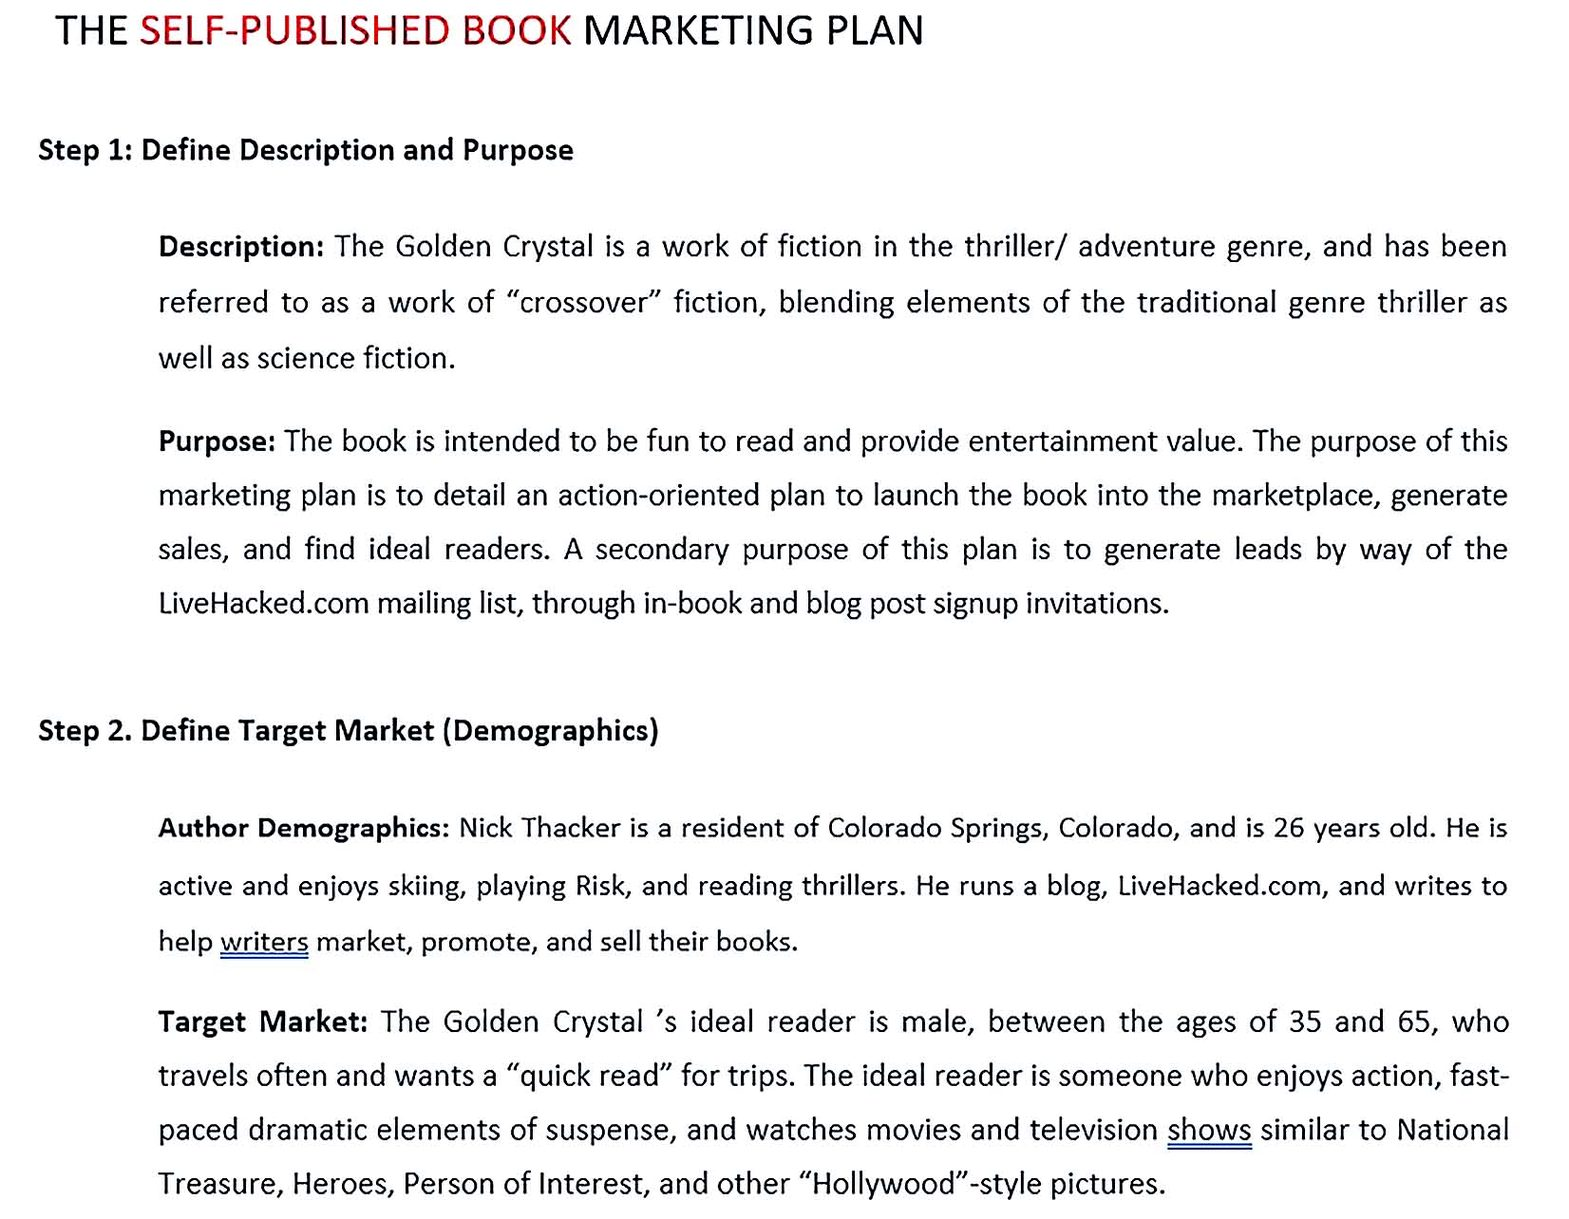 BMP Marketing Plan